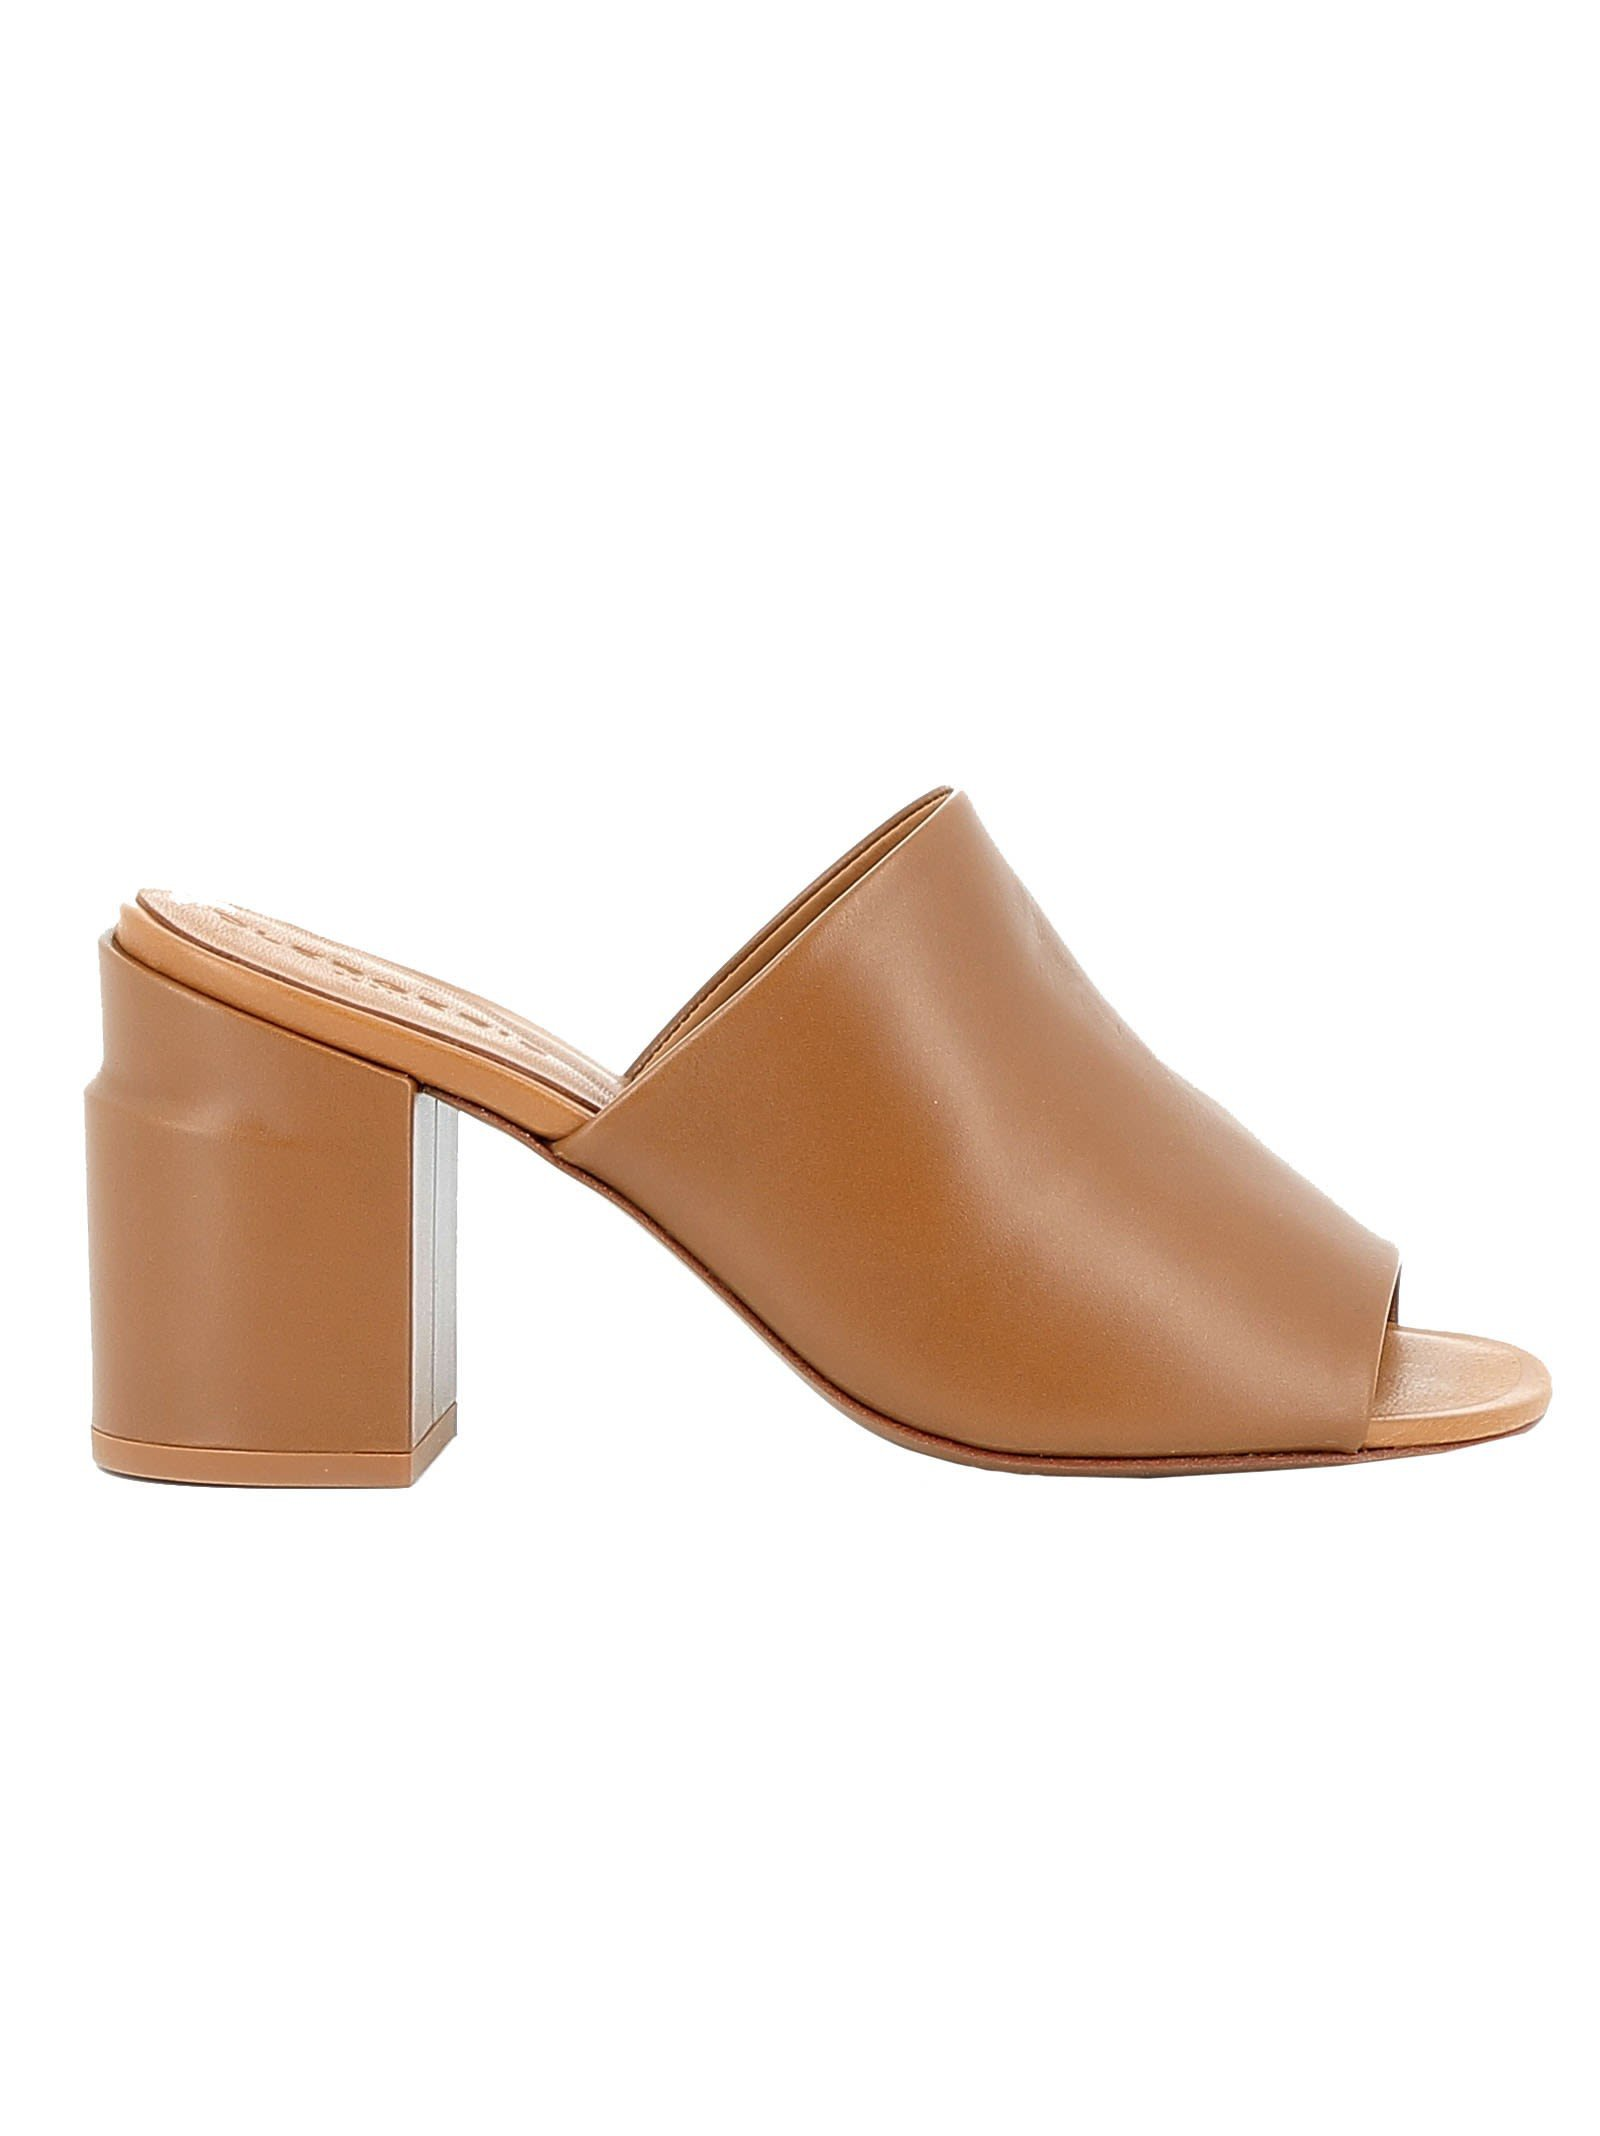 Robert Clergerie Papaya Leather Sandals